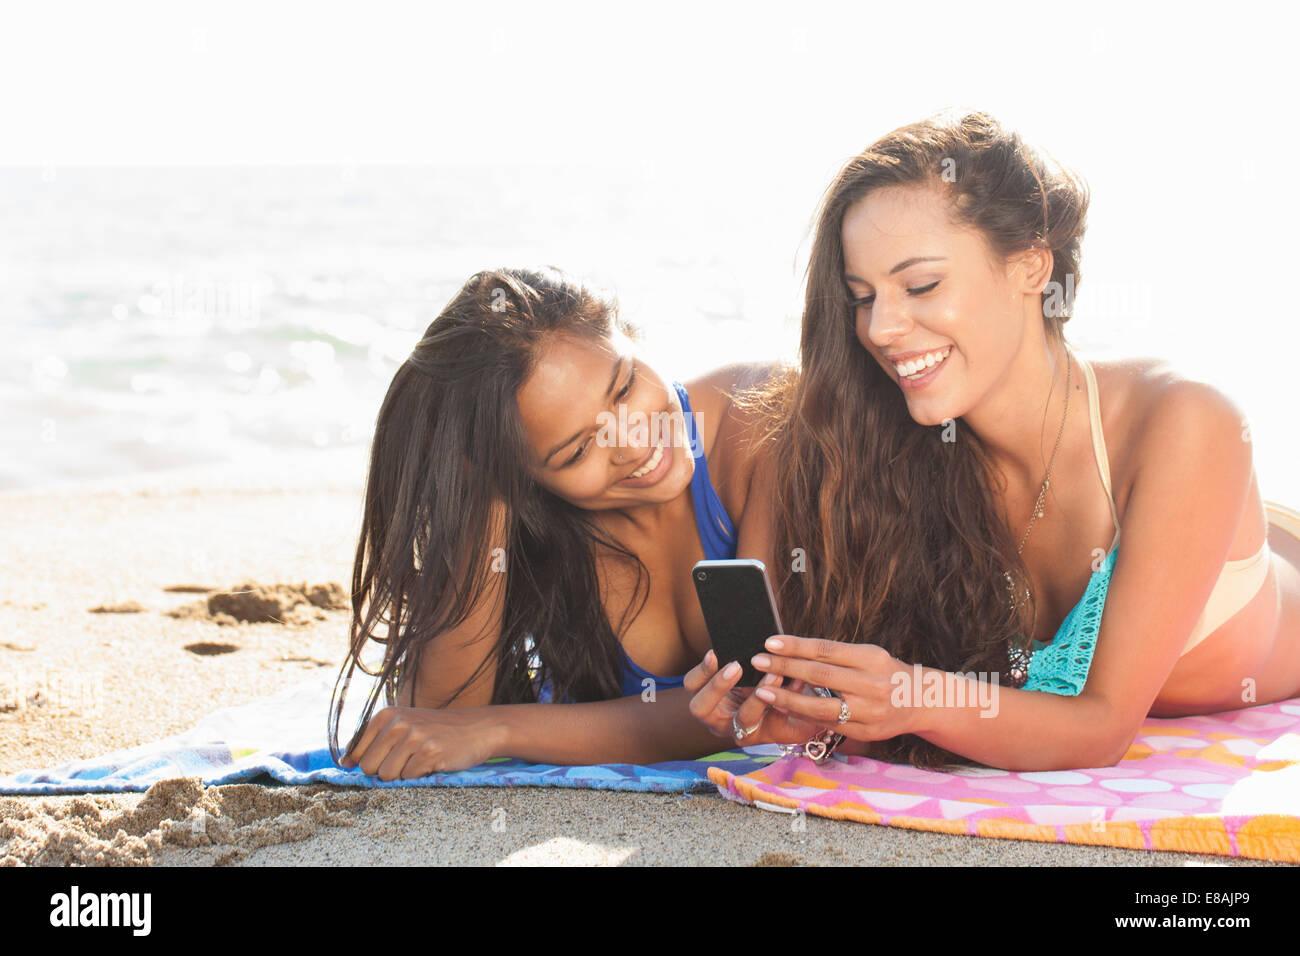 Two young women sunbathing and looking at smartphone on beach, Malibu, California, USA - Stock Image